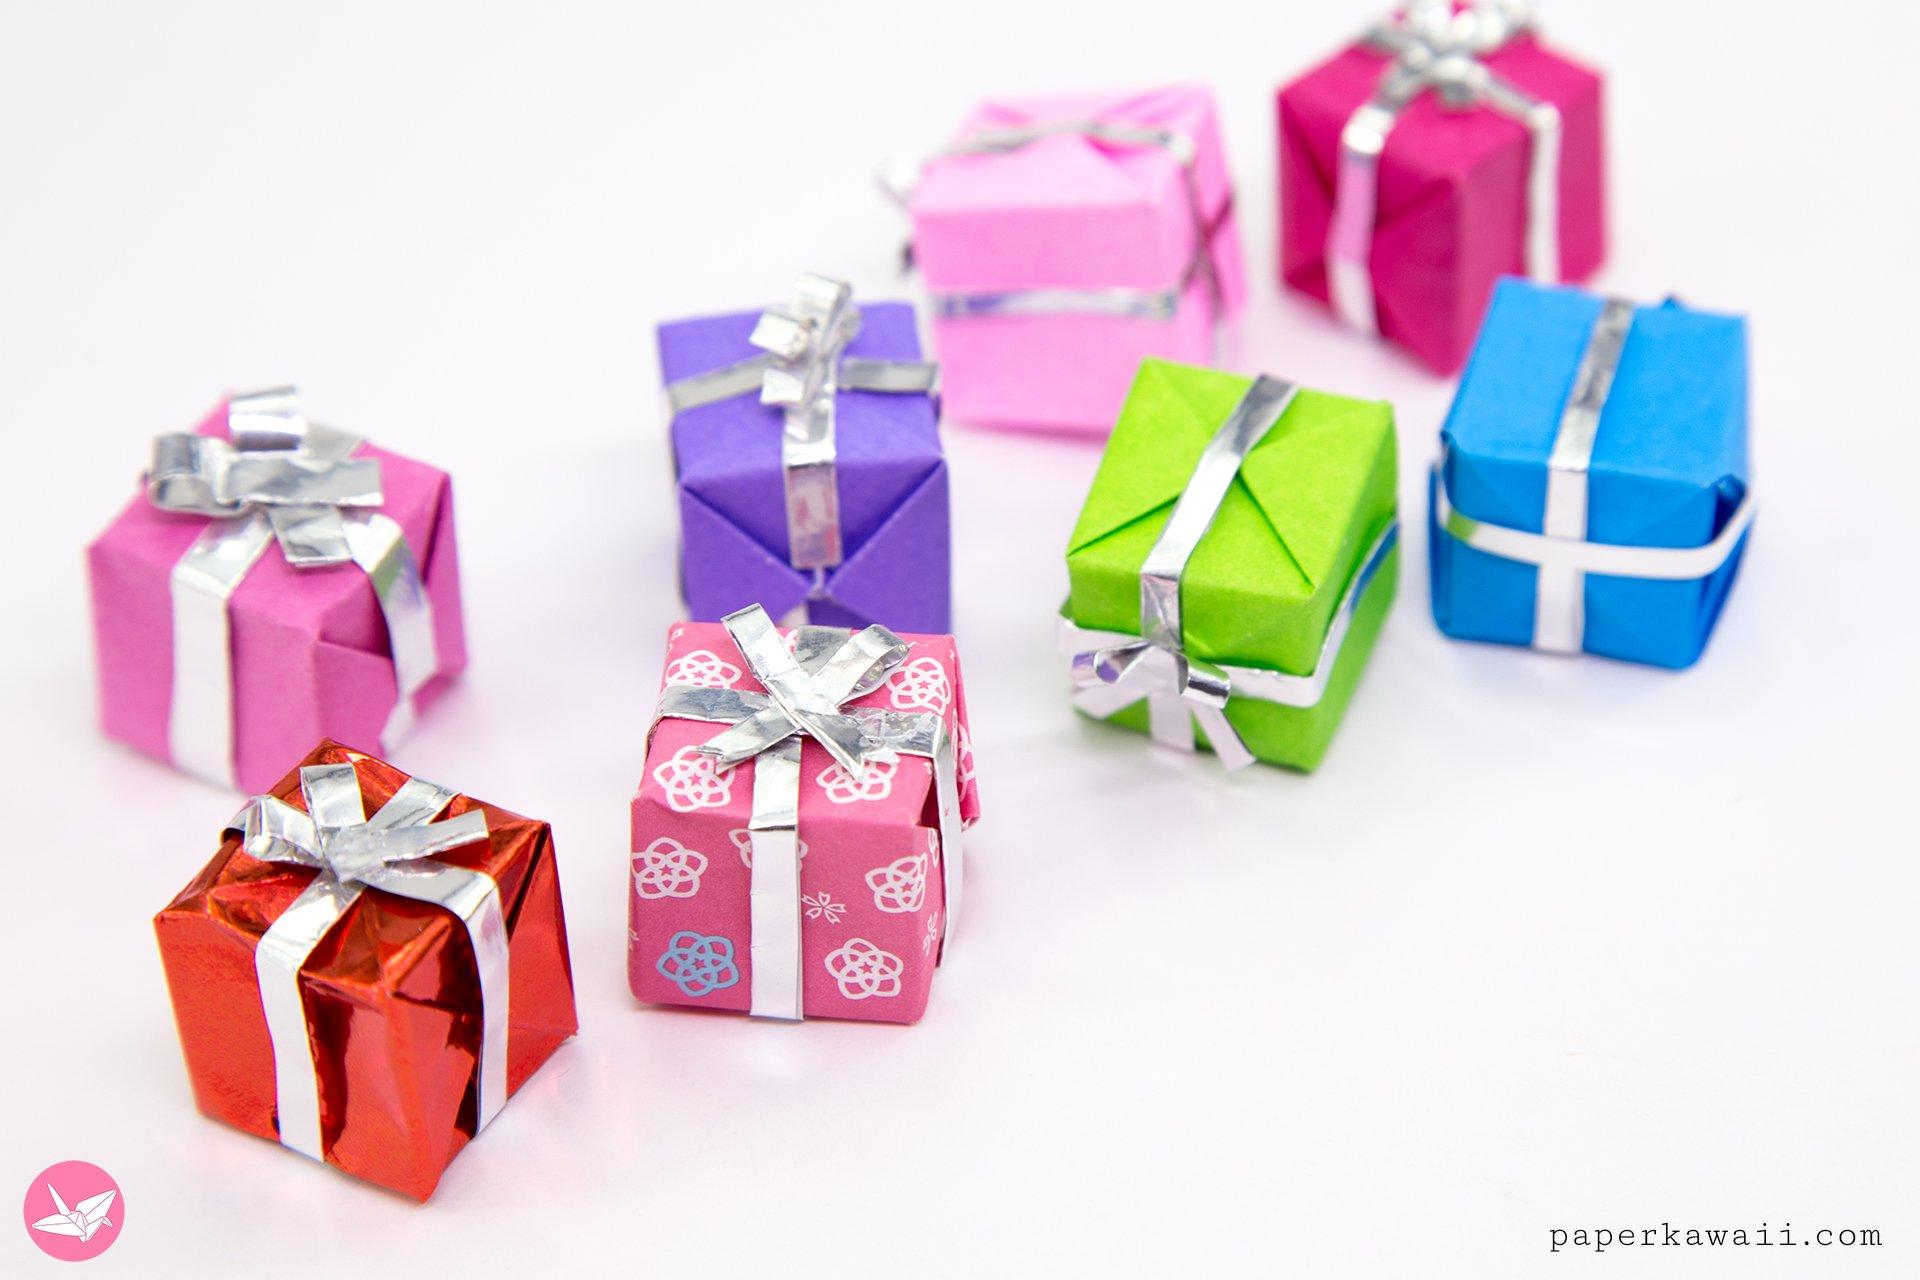 Cute Mini Origami Presents Tutorial - Paper Kawaii - photo#31